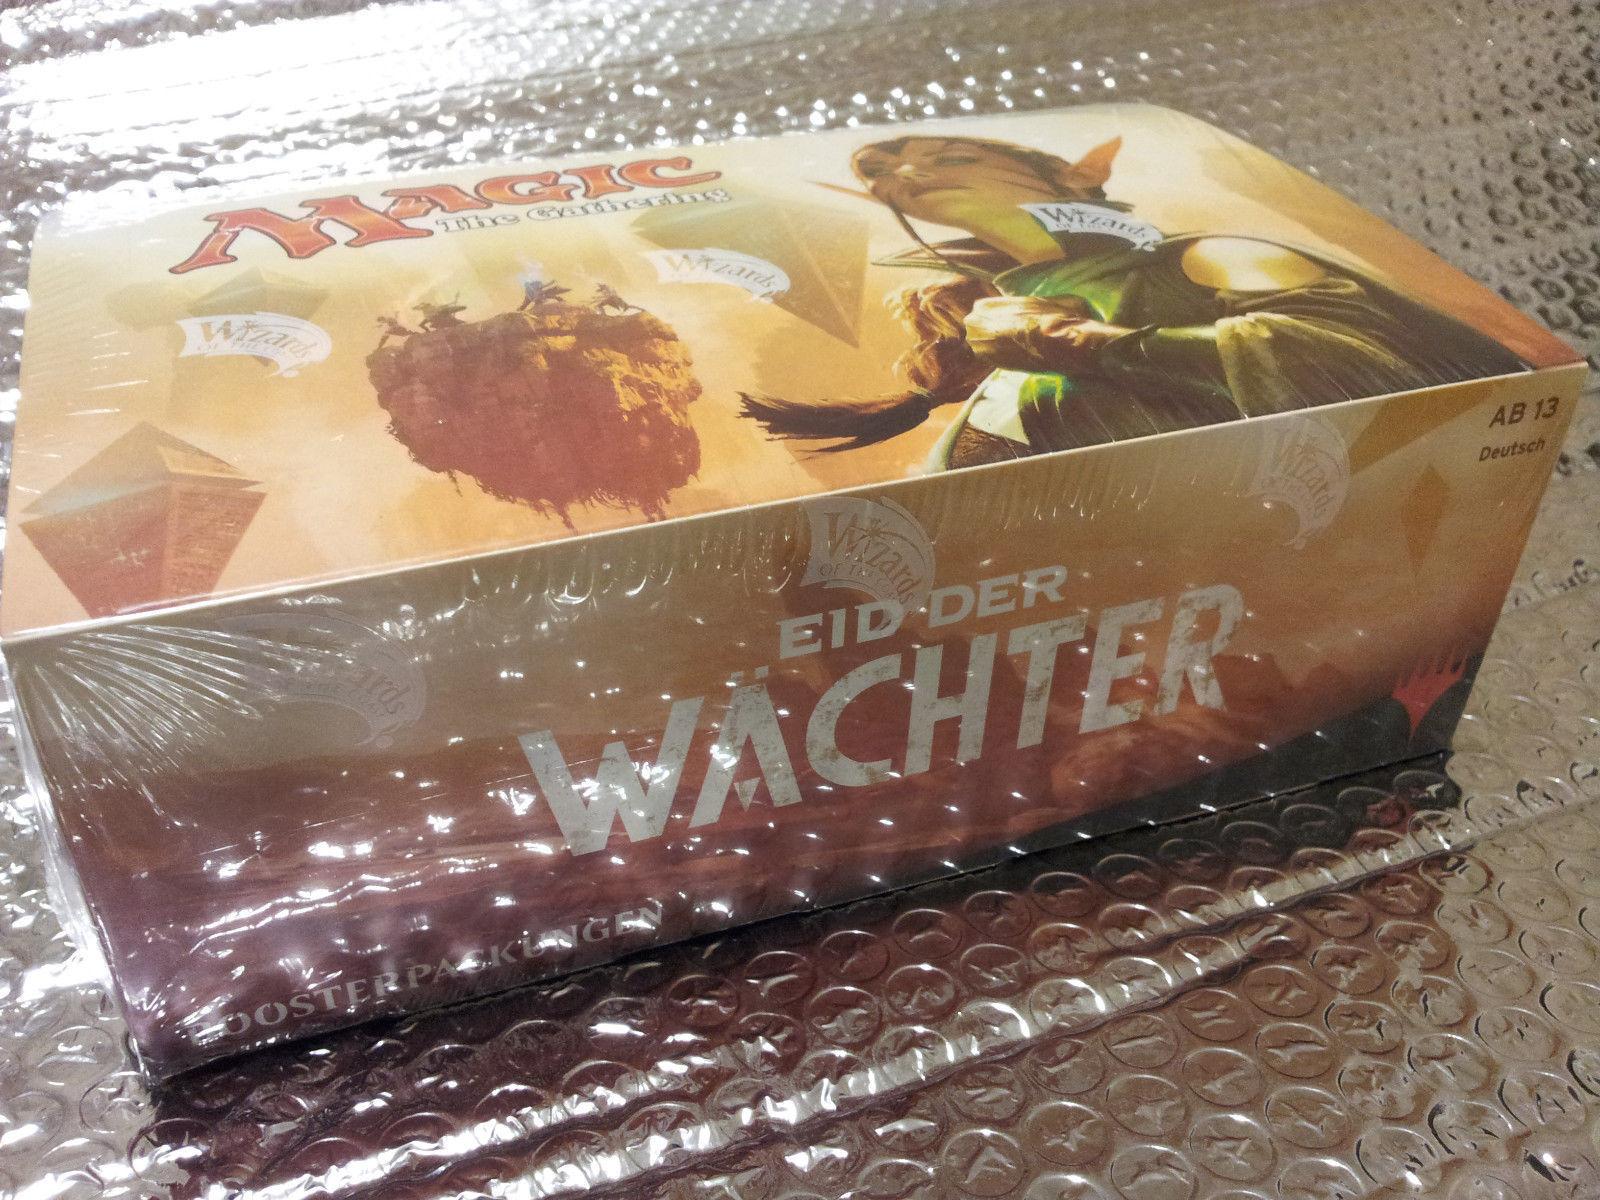 GERMAN Magic MTG Oath of the Gatewatch Gatewatch Gatewatch OGW Factory Sealed Booster Box Gathering d33230